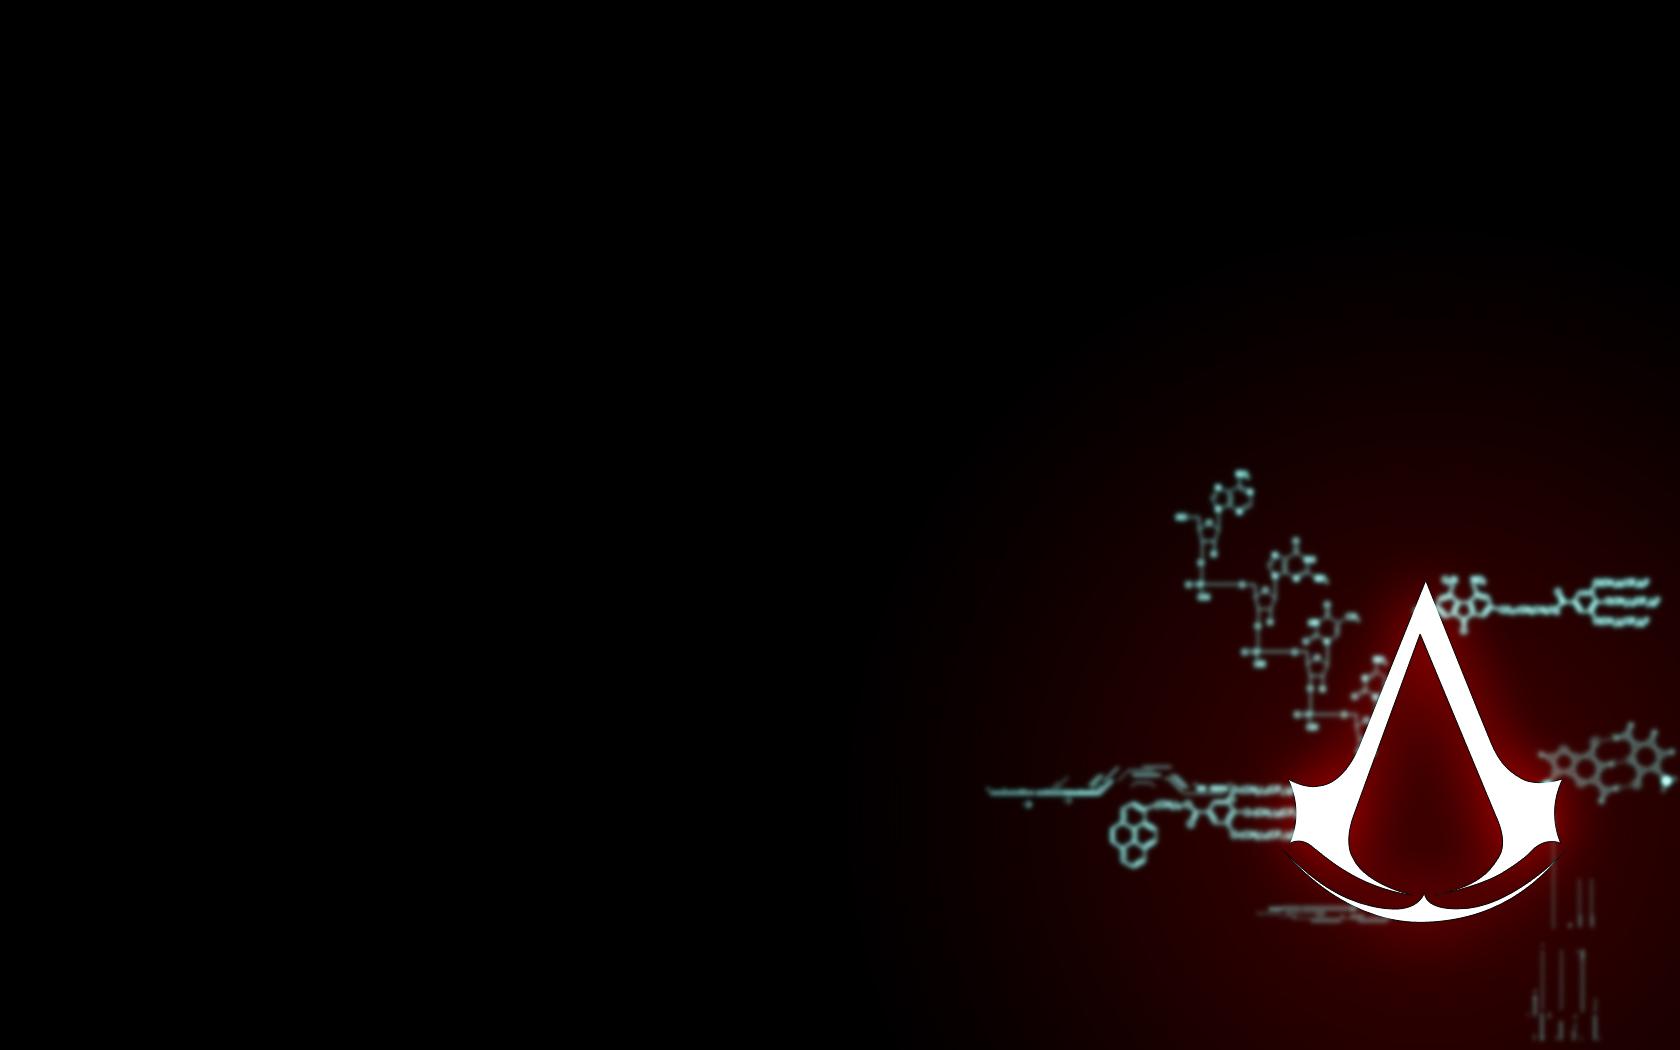 Assassins Creed: Brotherhood Full HD Wallpapers | Wide Screen Wallpaper 1080p,2K,4K